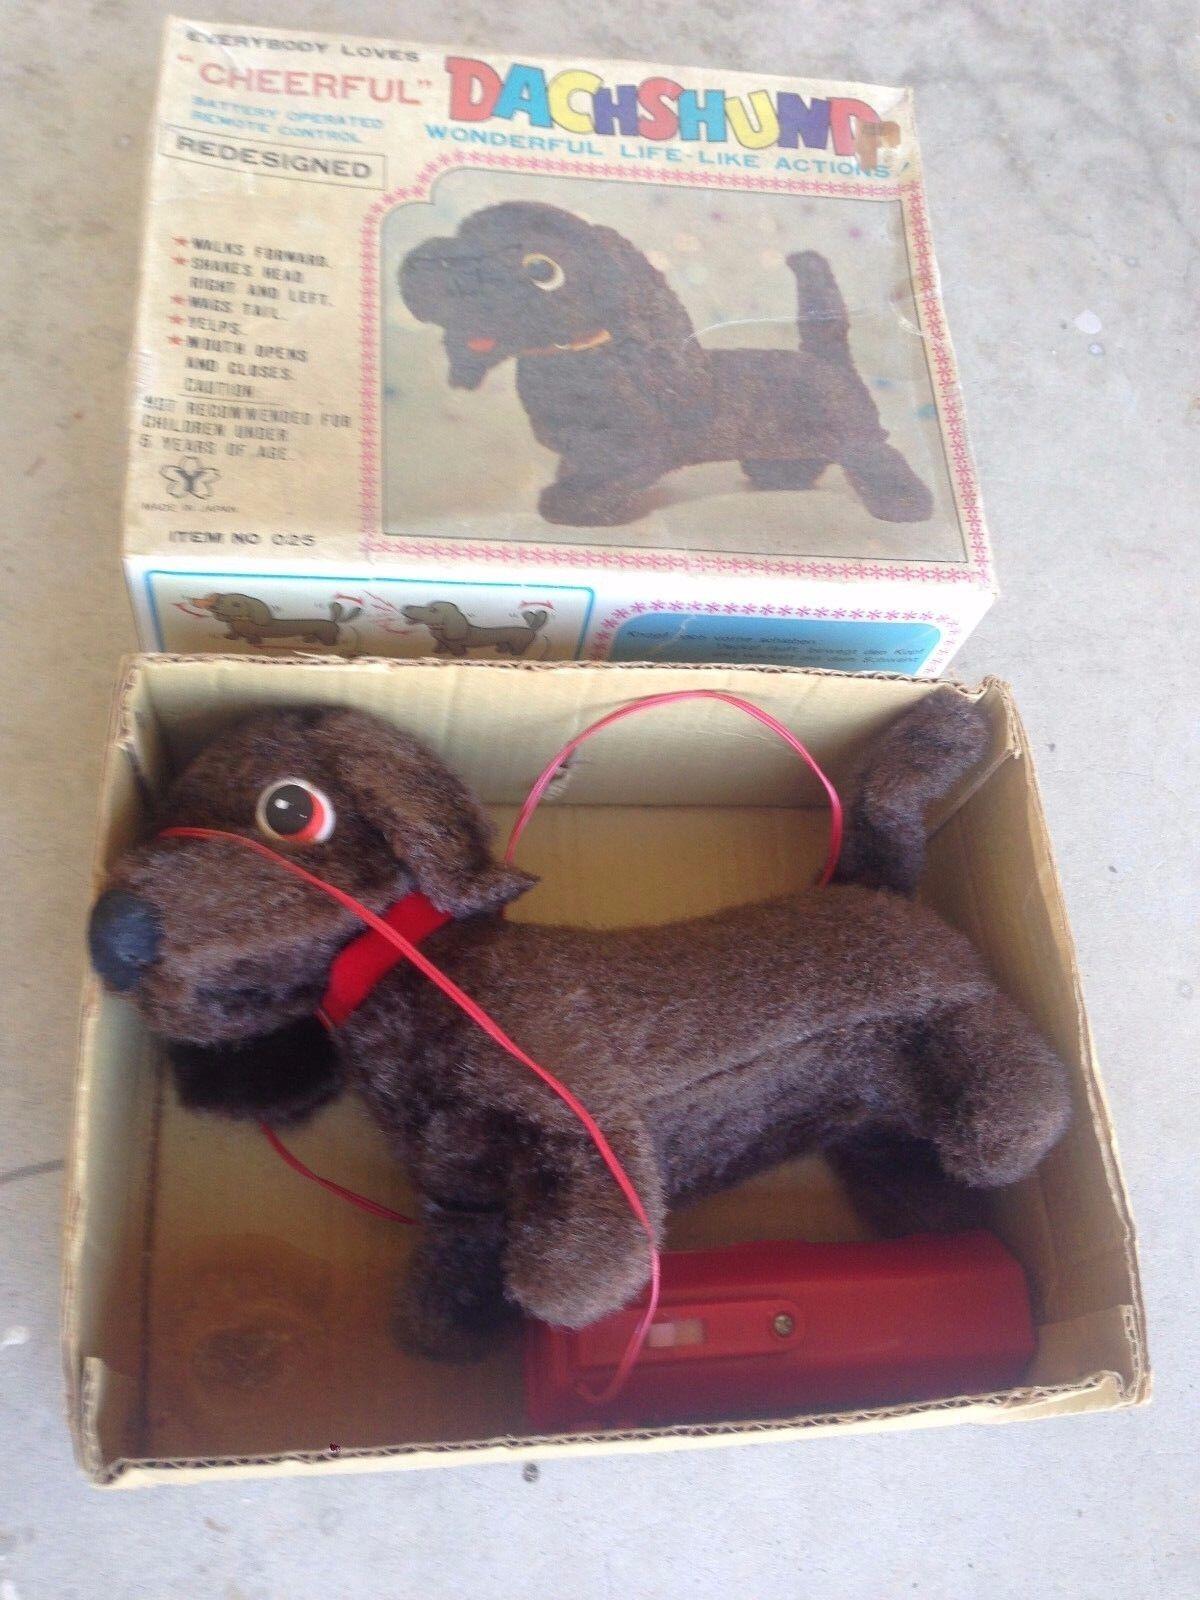 Vintage Cheerful Dachshund Puppy Remote Battery Operated Dog Original Box 1960s